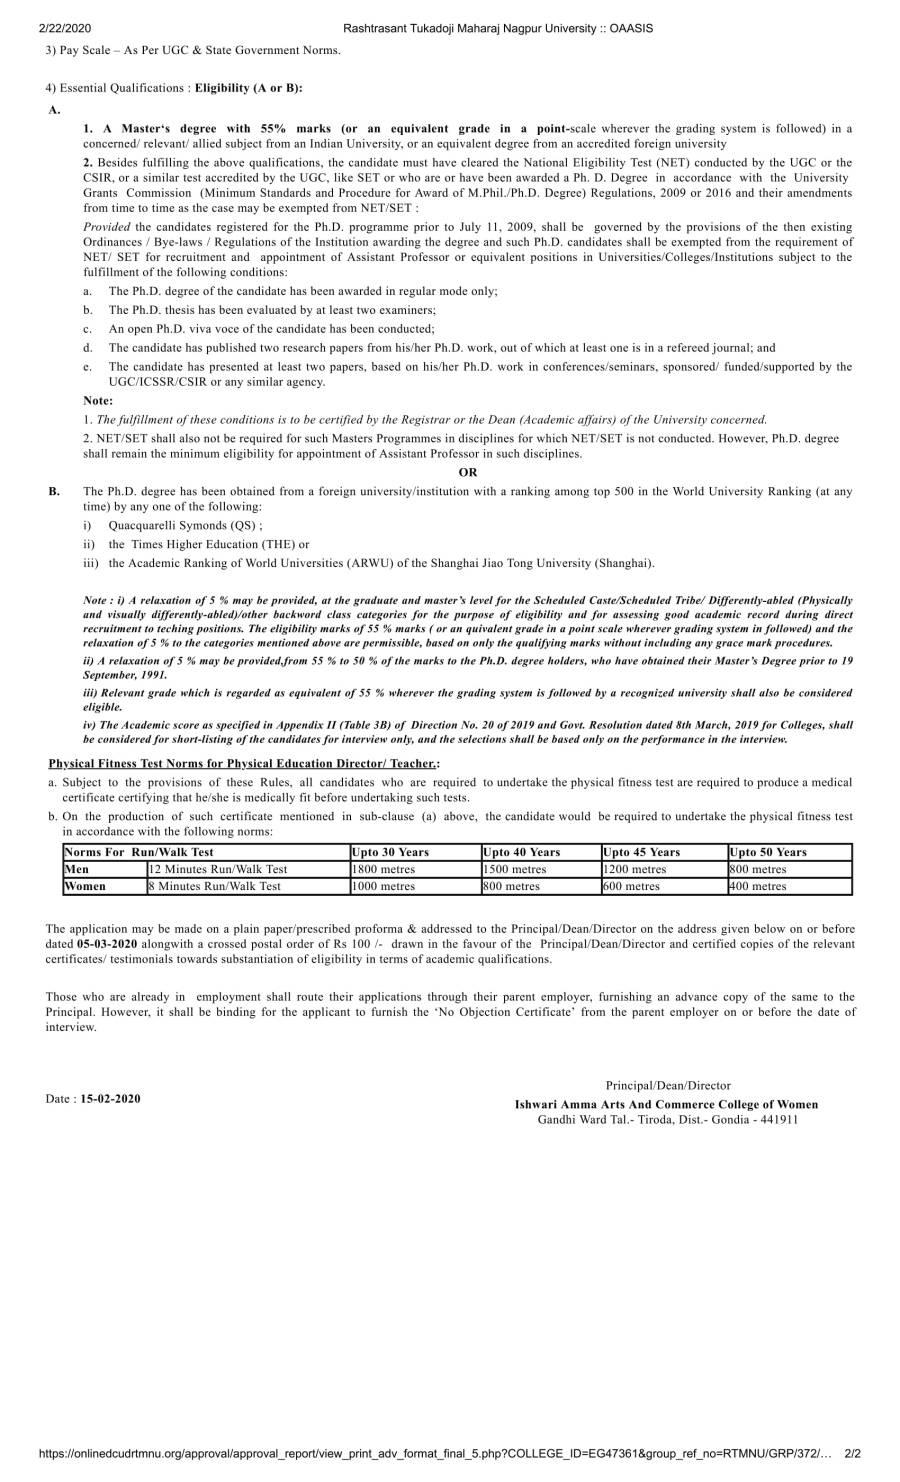 Rashtrasant Tukadoji Maharaj Nagpur University __ OAASIS-2